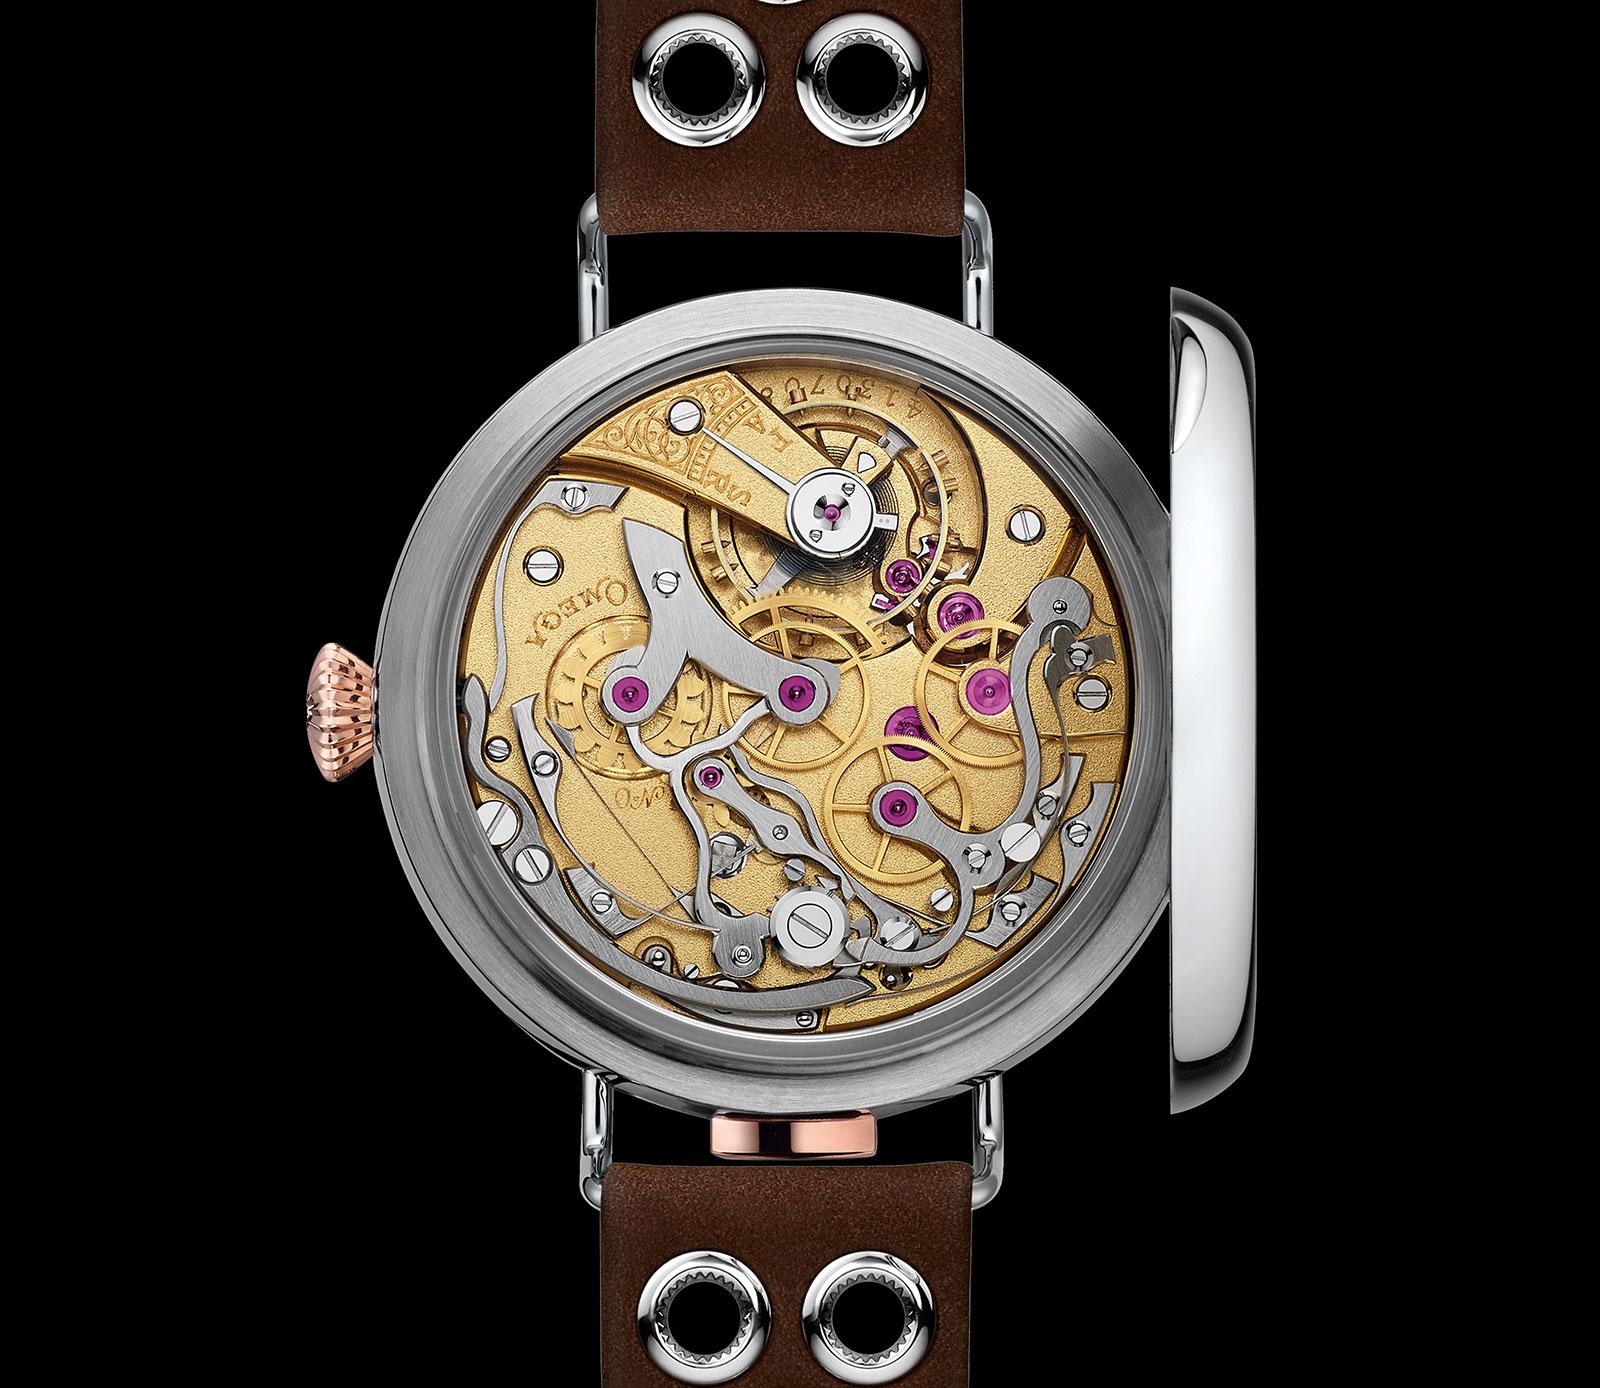 First OMEGA Wrist-Chronograph Limited Edition 18'''CHRO 9